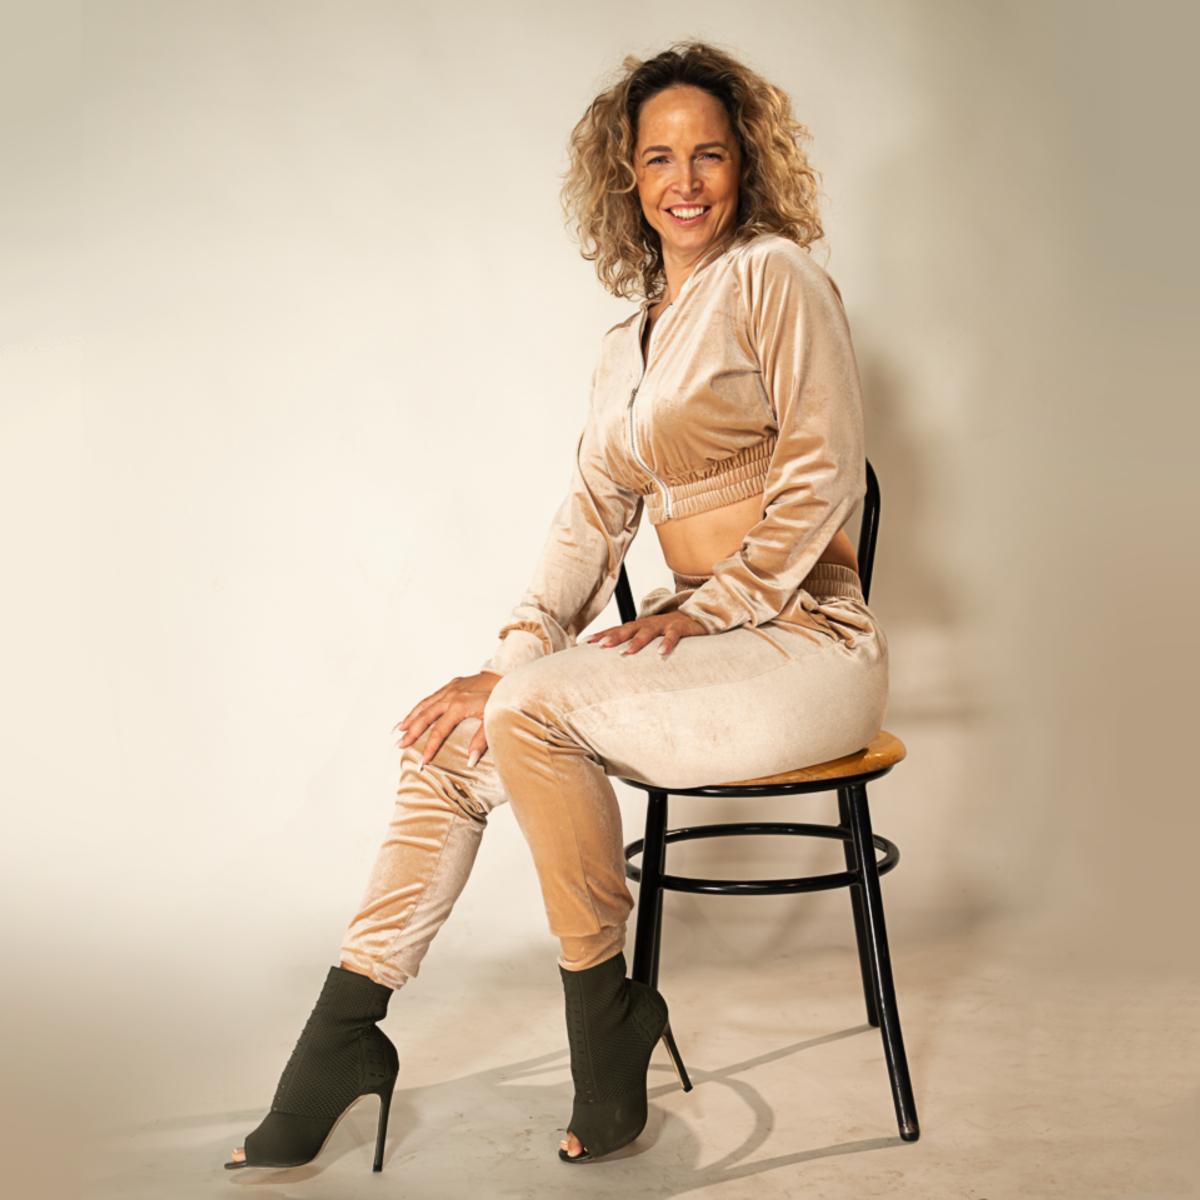 Tamara-Kramer-Beige-set01-1.png